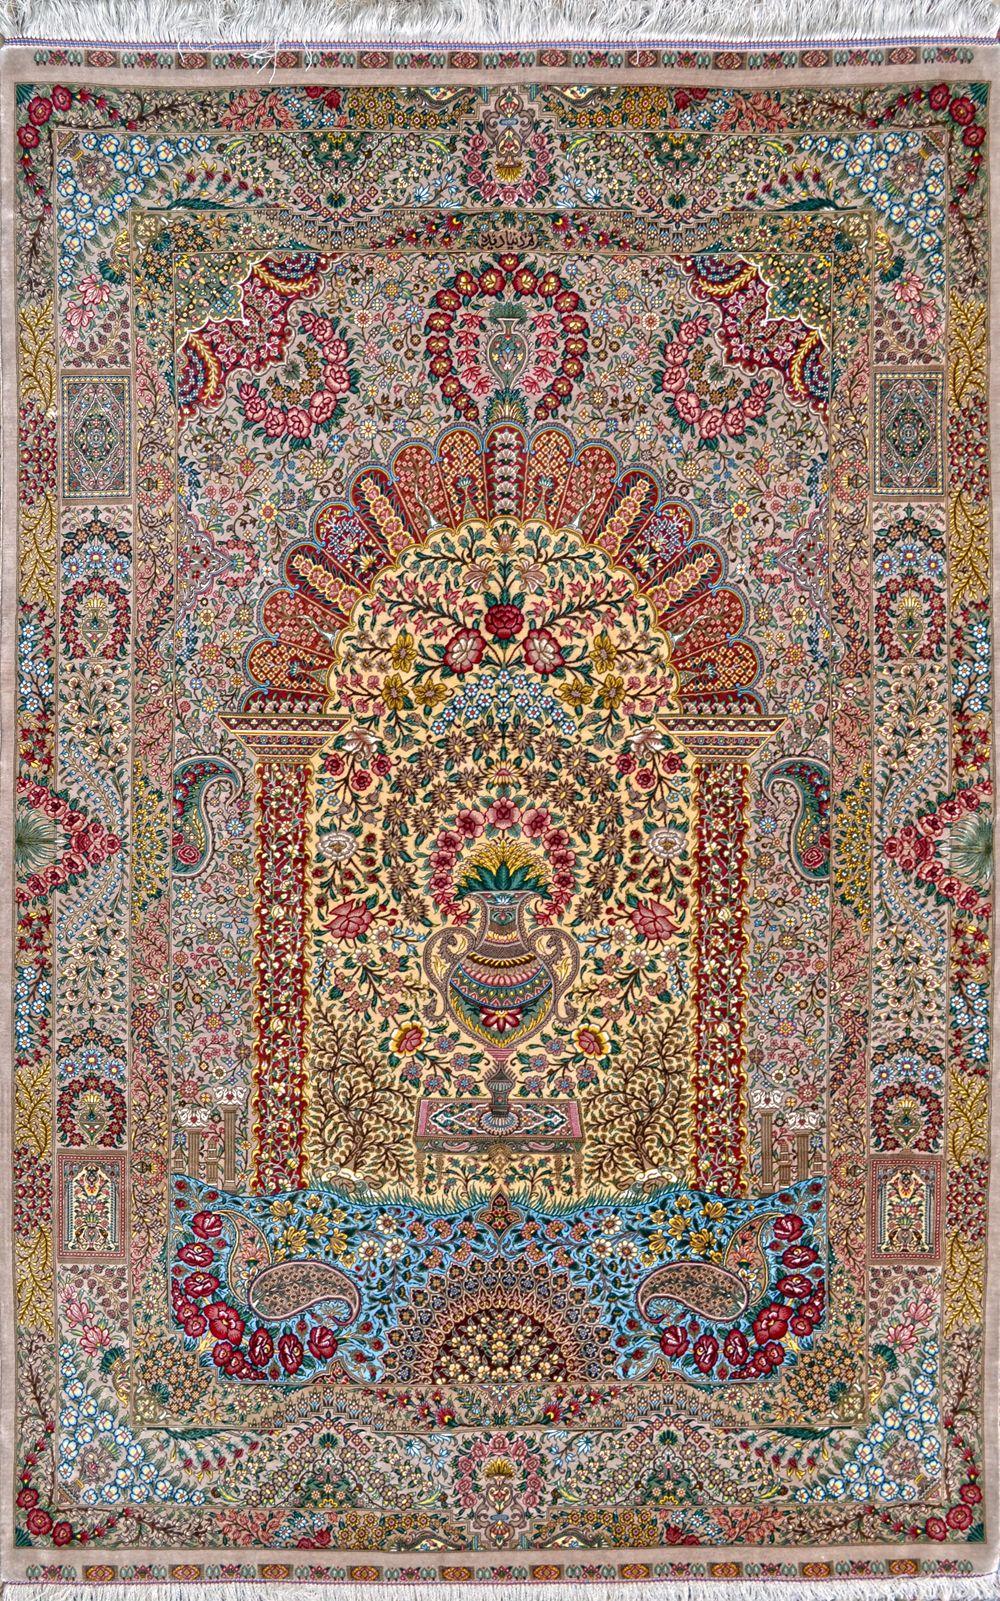 Flower Vase Mehrabi Design Qum Pure Silk Silk Persian Rug Item Hf 1431 Silk Persian Rugs Rugs Persian Rug